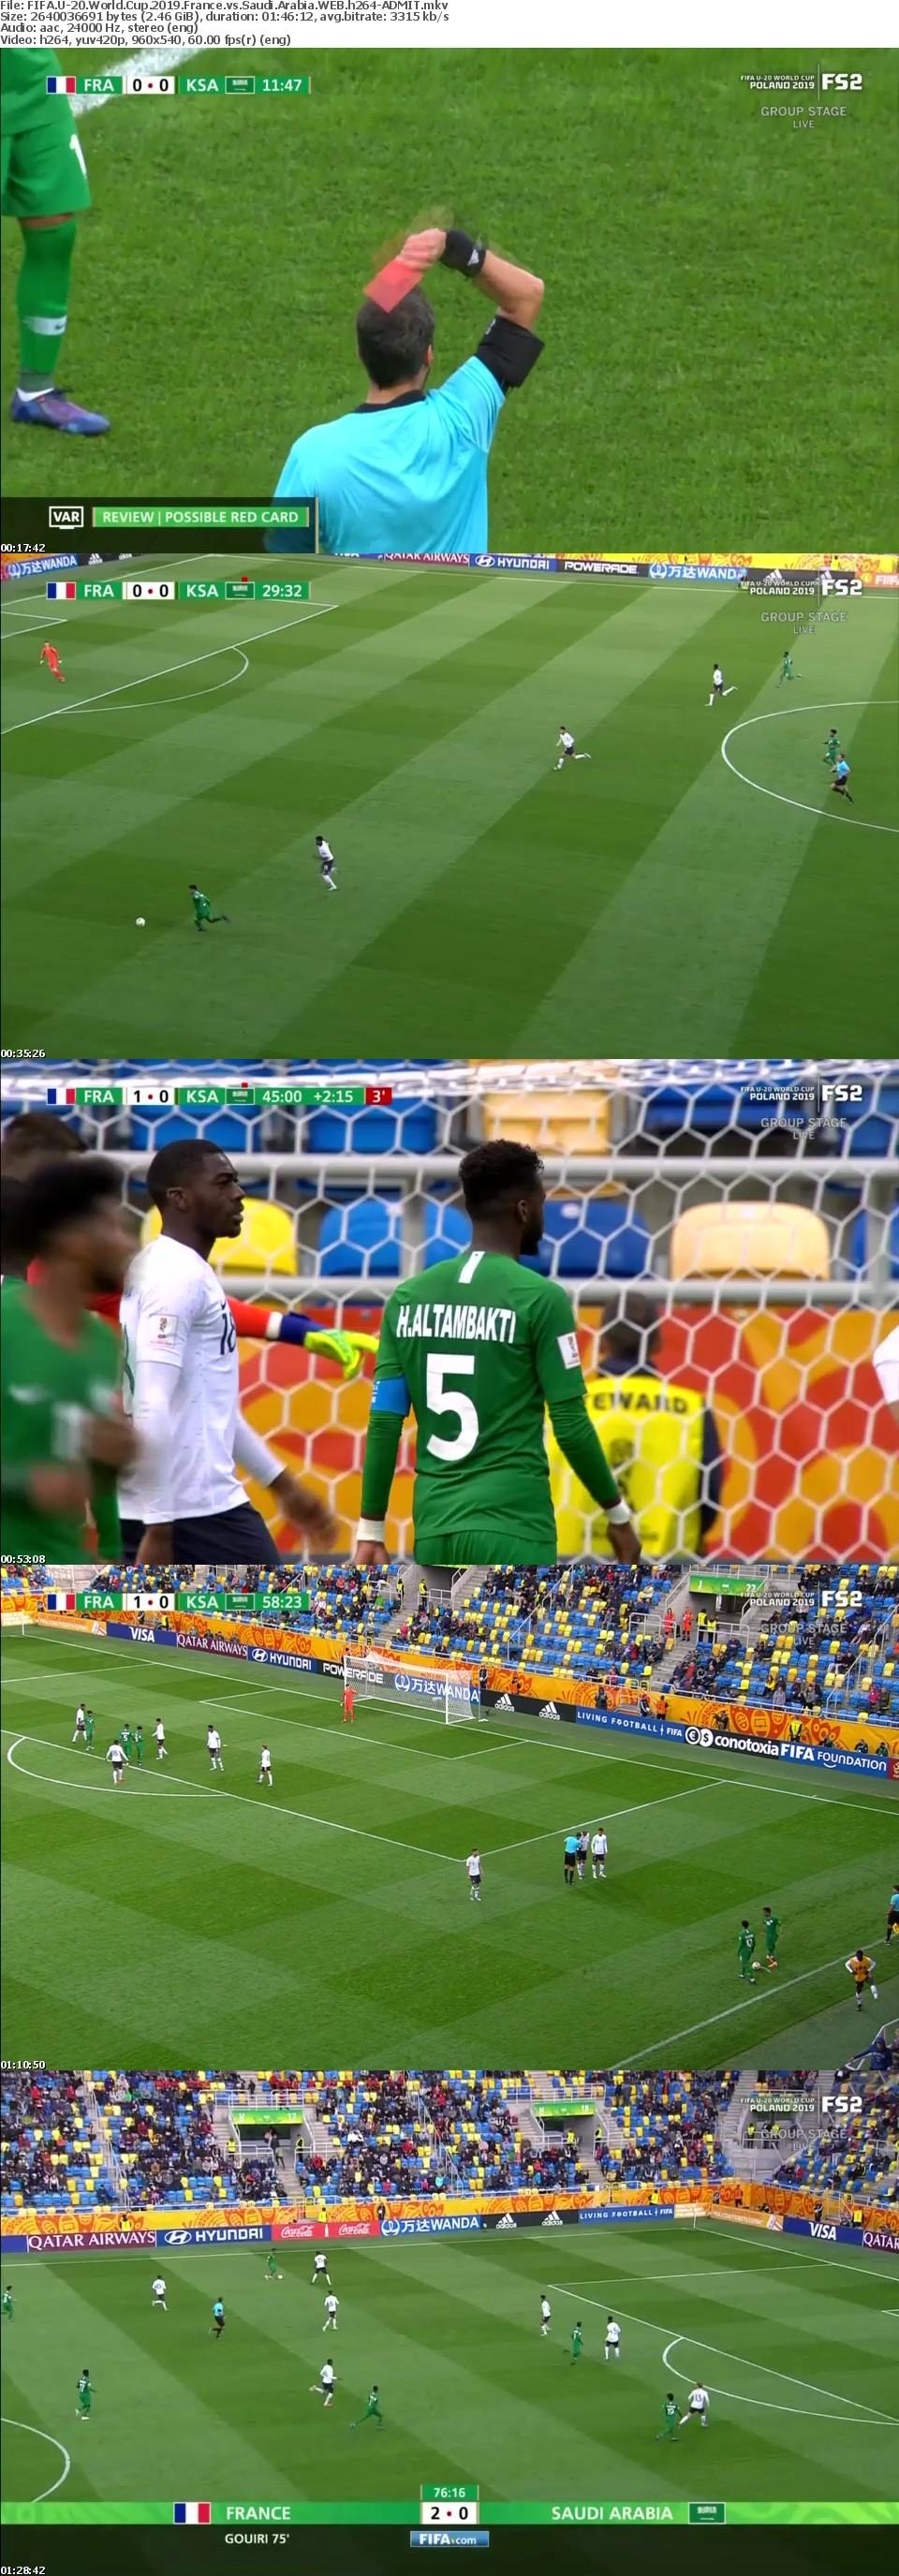 FIFA U-20 World Cup 2019 France vs Saudi Arabia WEB h264-ADMIT